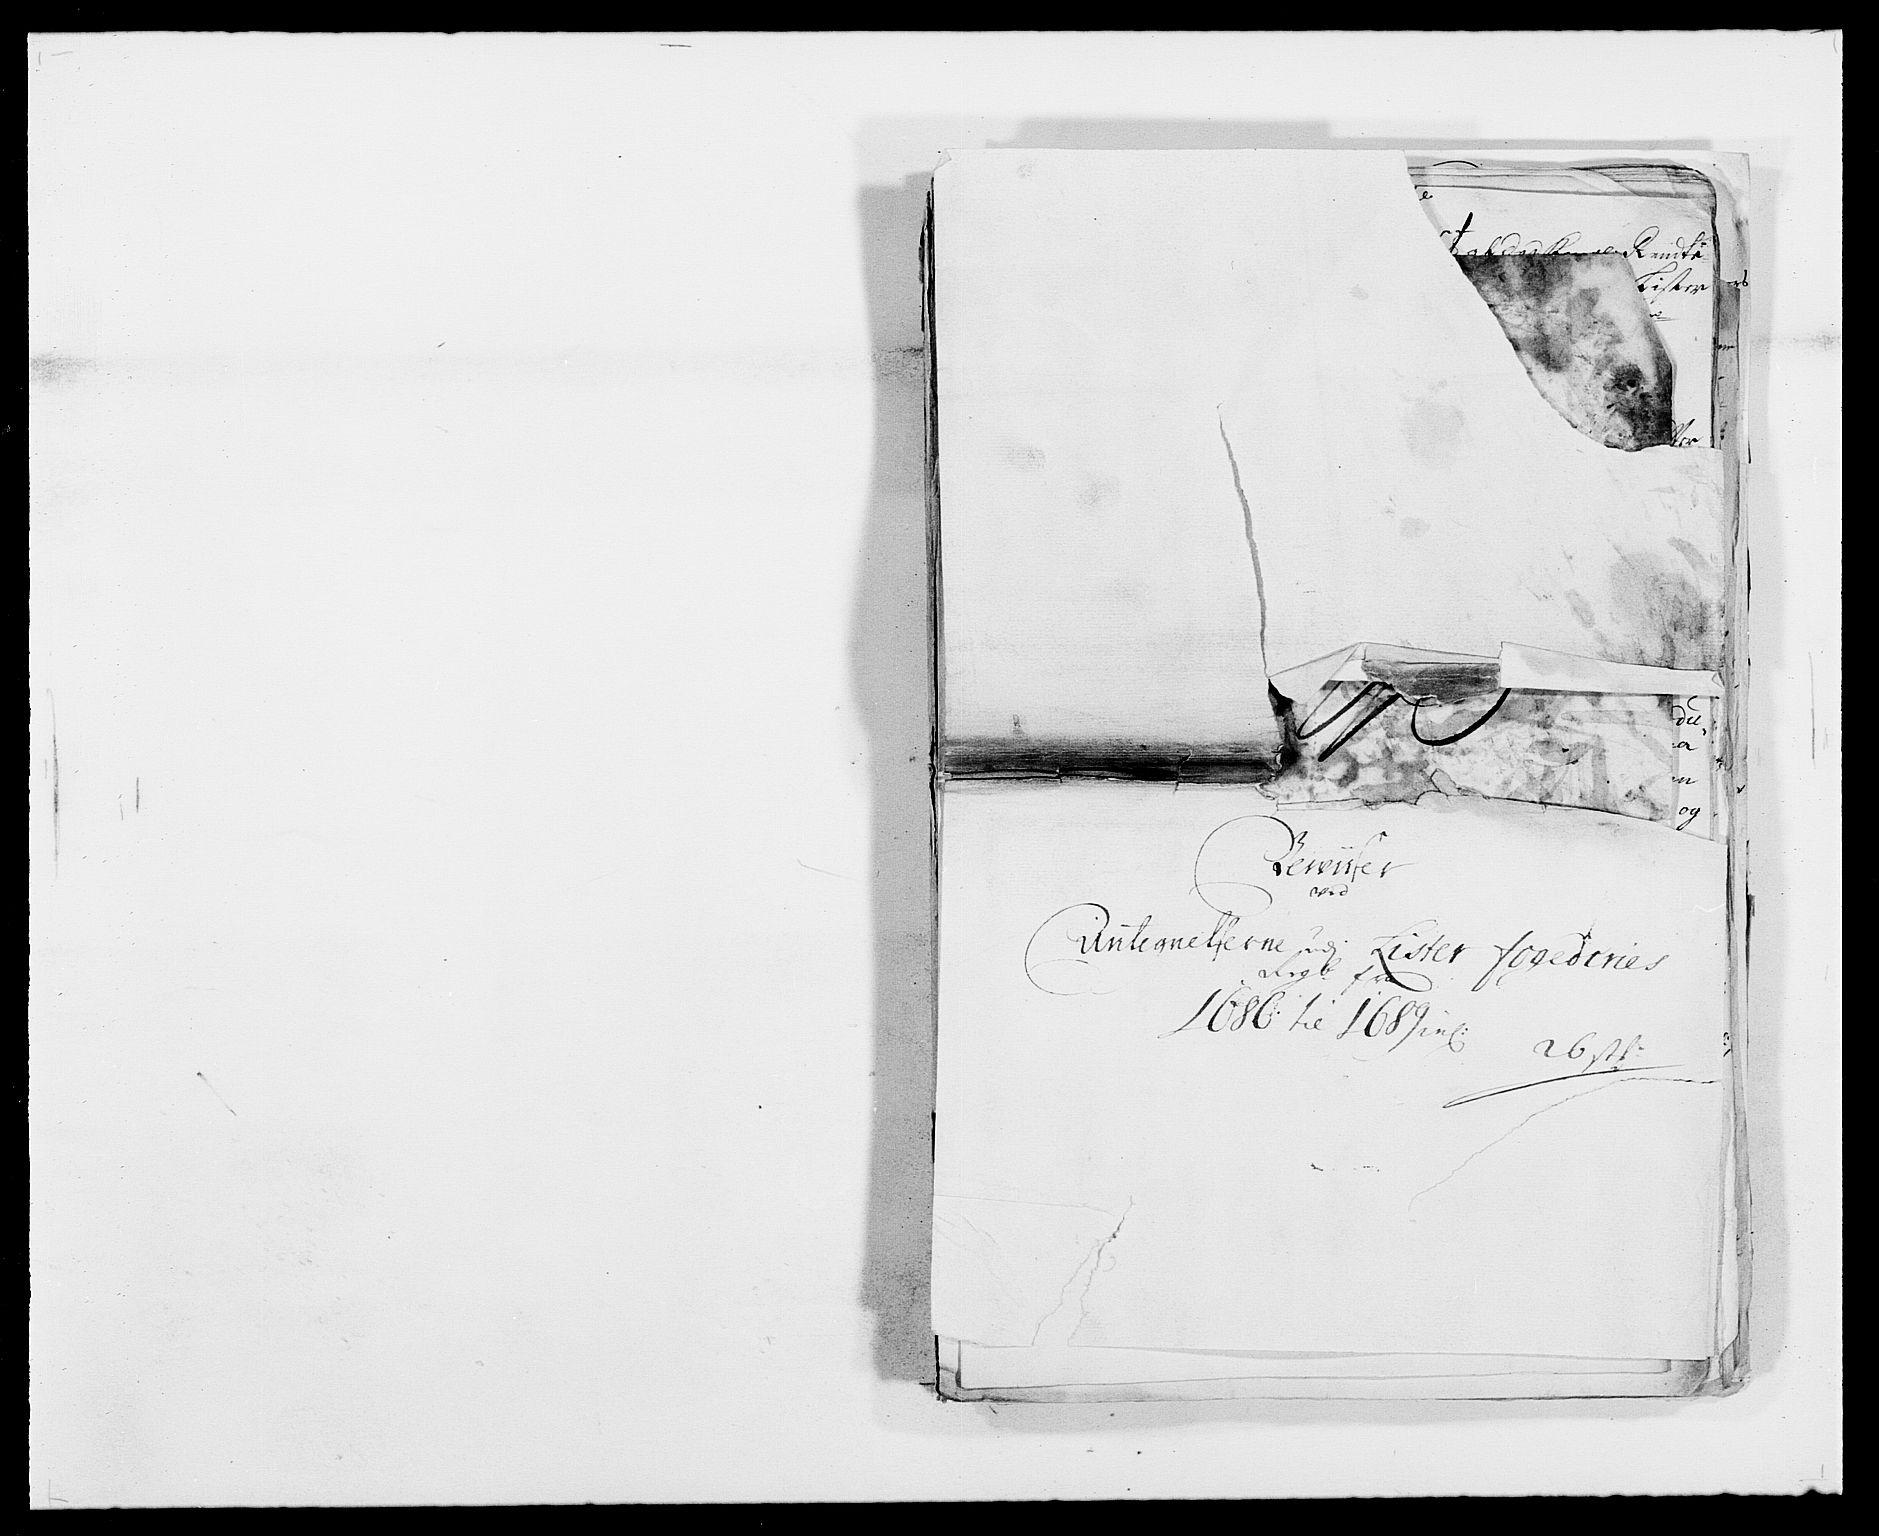 RA, Rentekammeret inntil 1814, Reviderte regnskaper, Fogderegnskap, R41/L2535: Fogderegnskap Lista, 1686-1689, s. 159